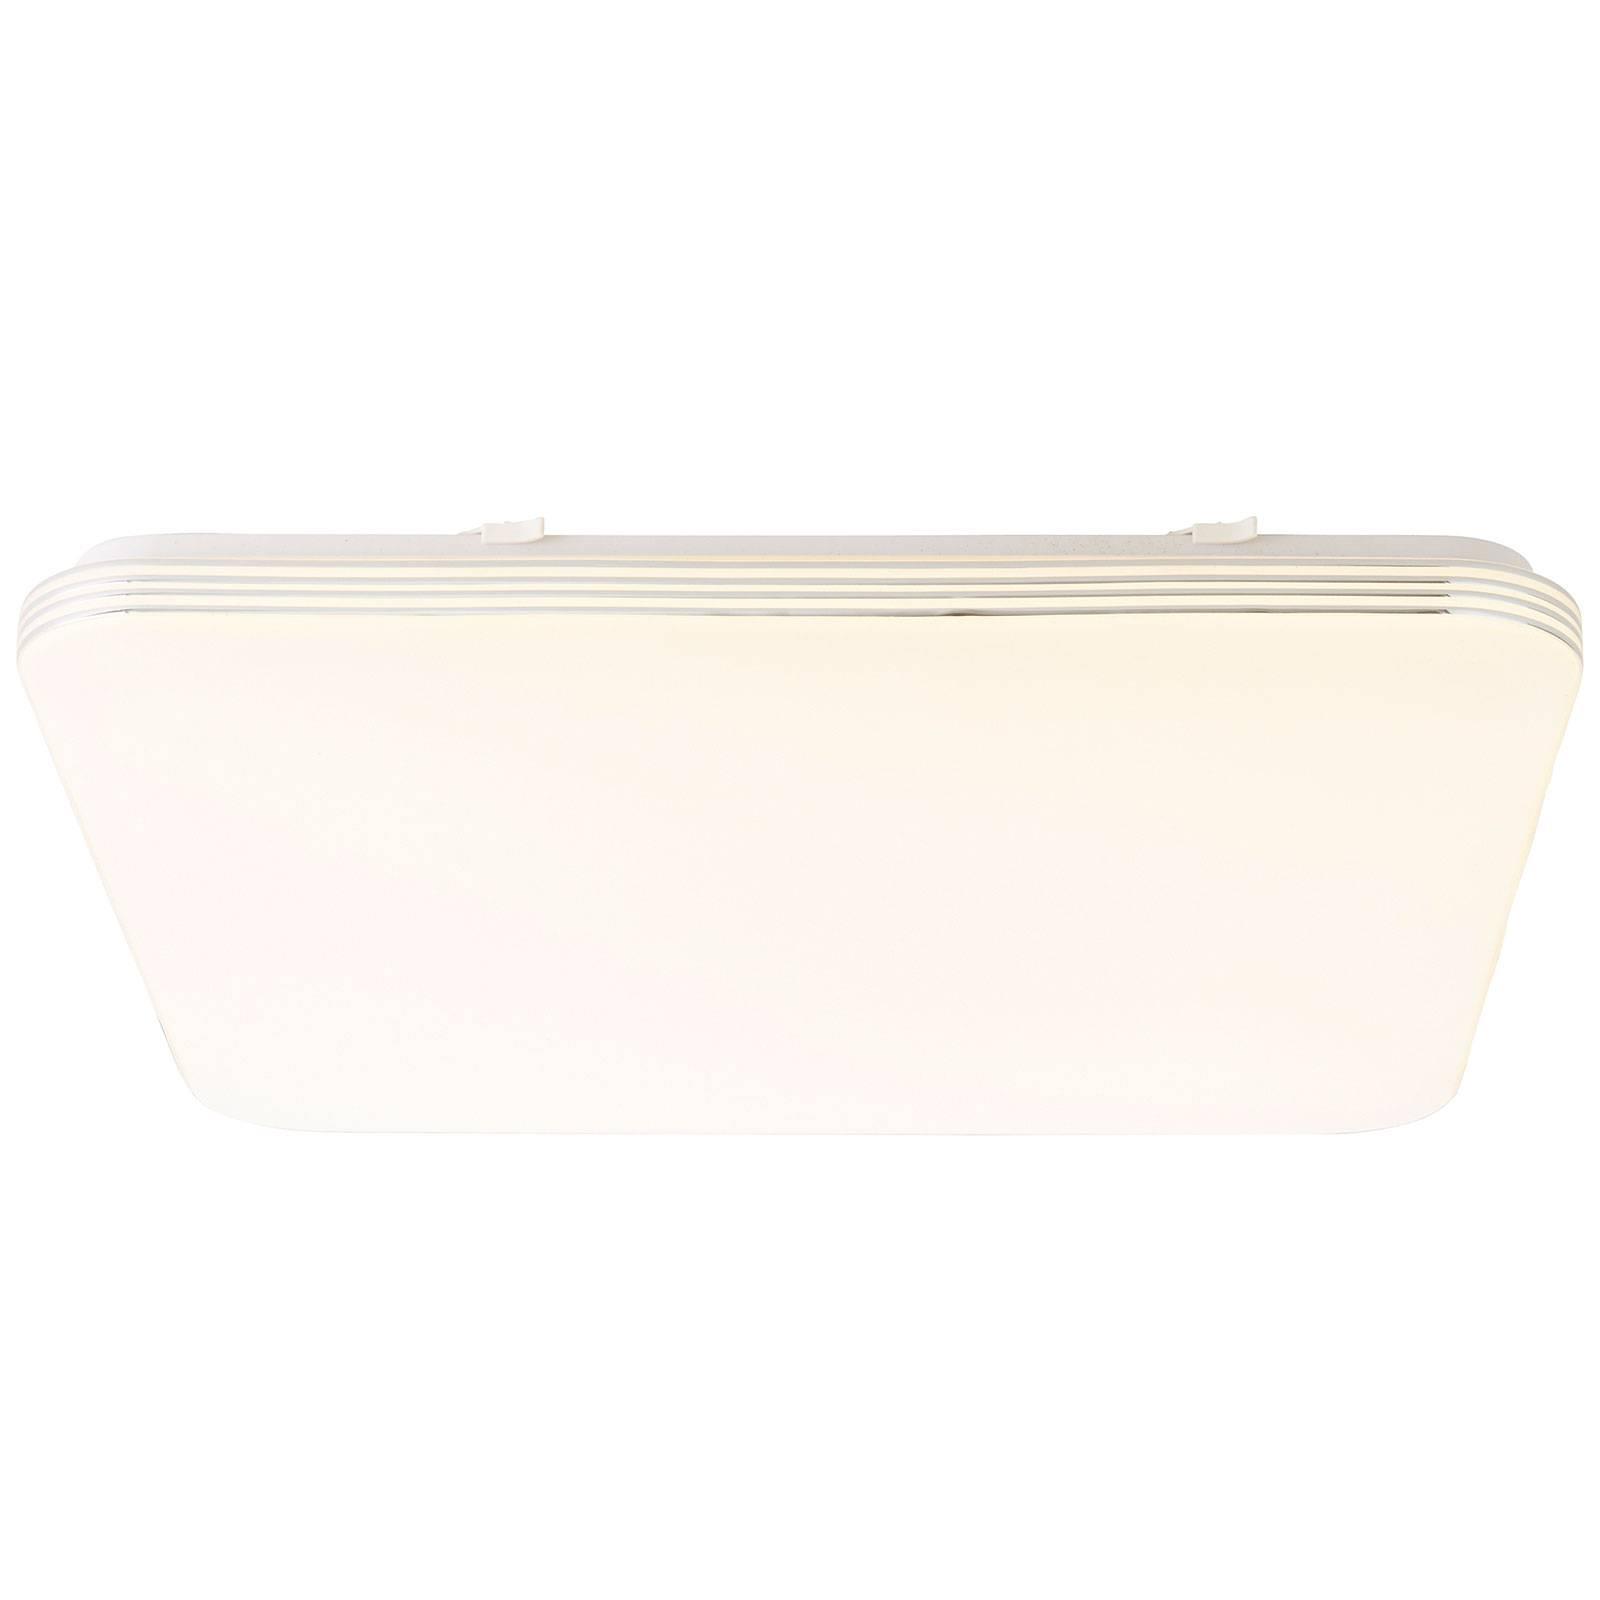 Plafonnier LED Ariella en blanc/chromé, 54x54cm